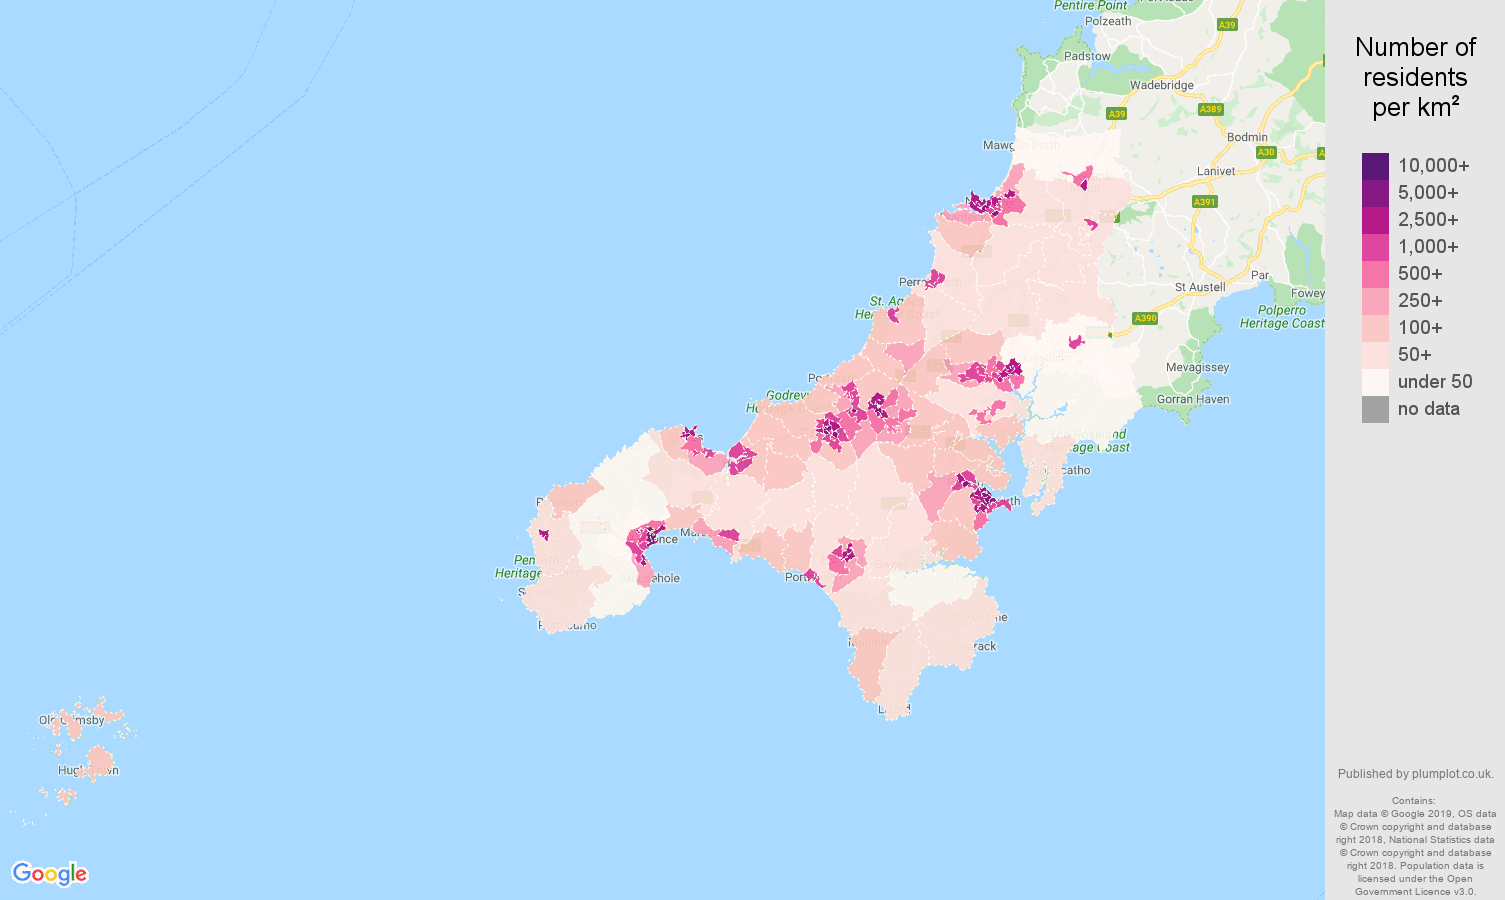 Truro population density map